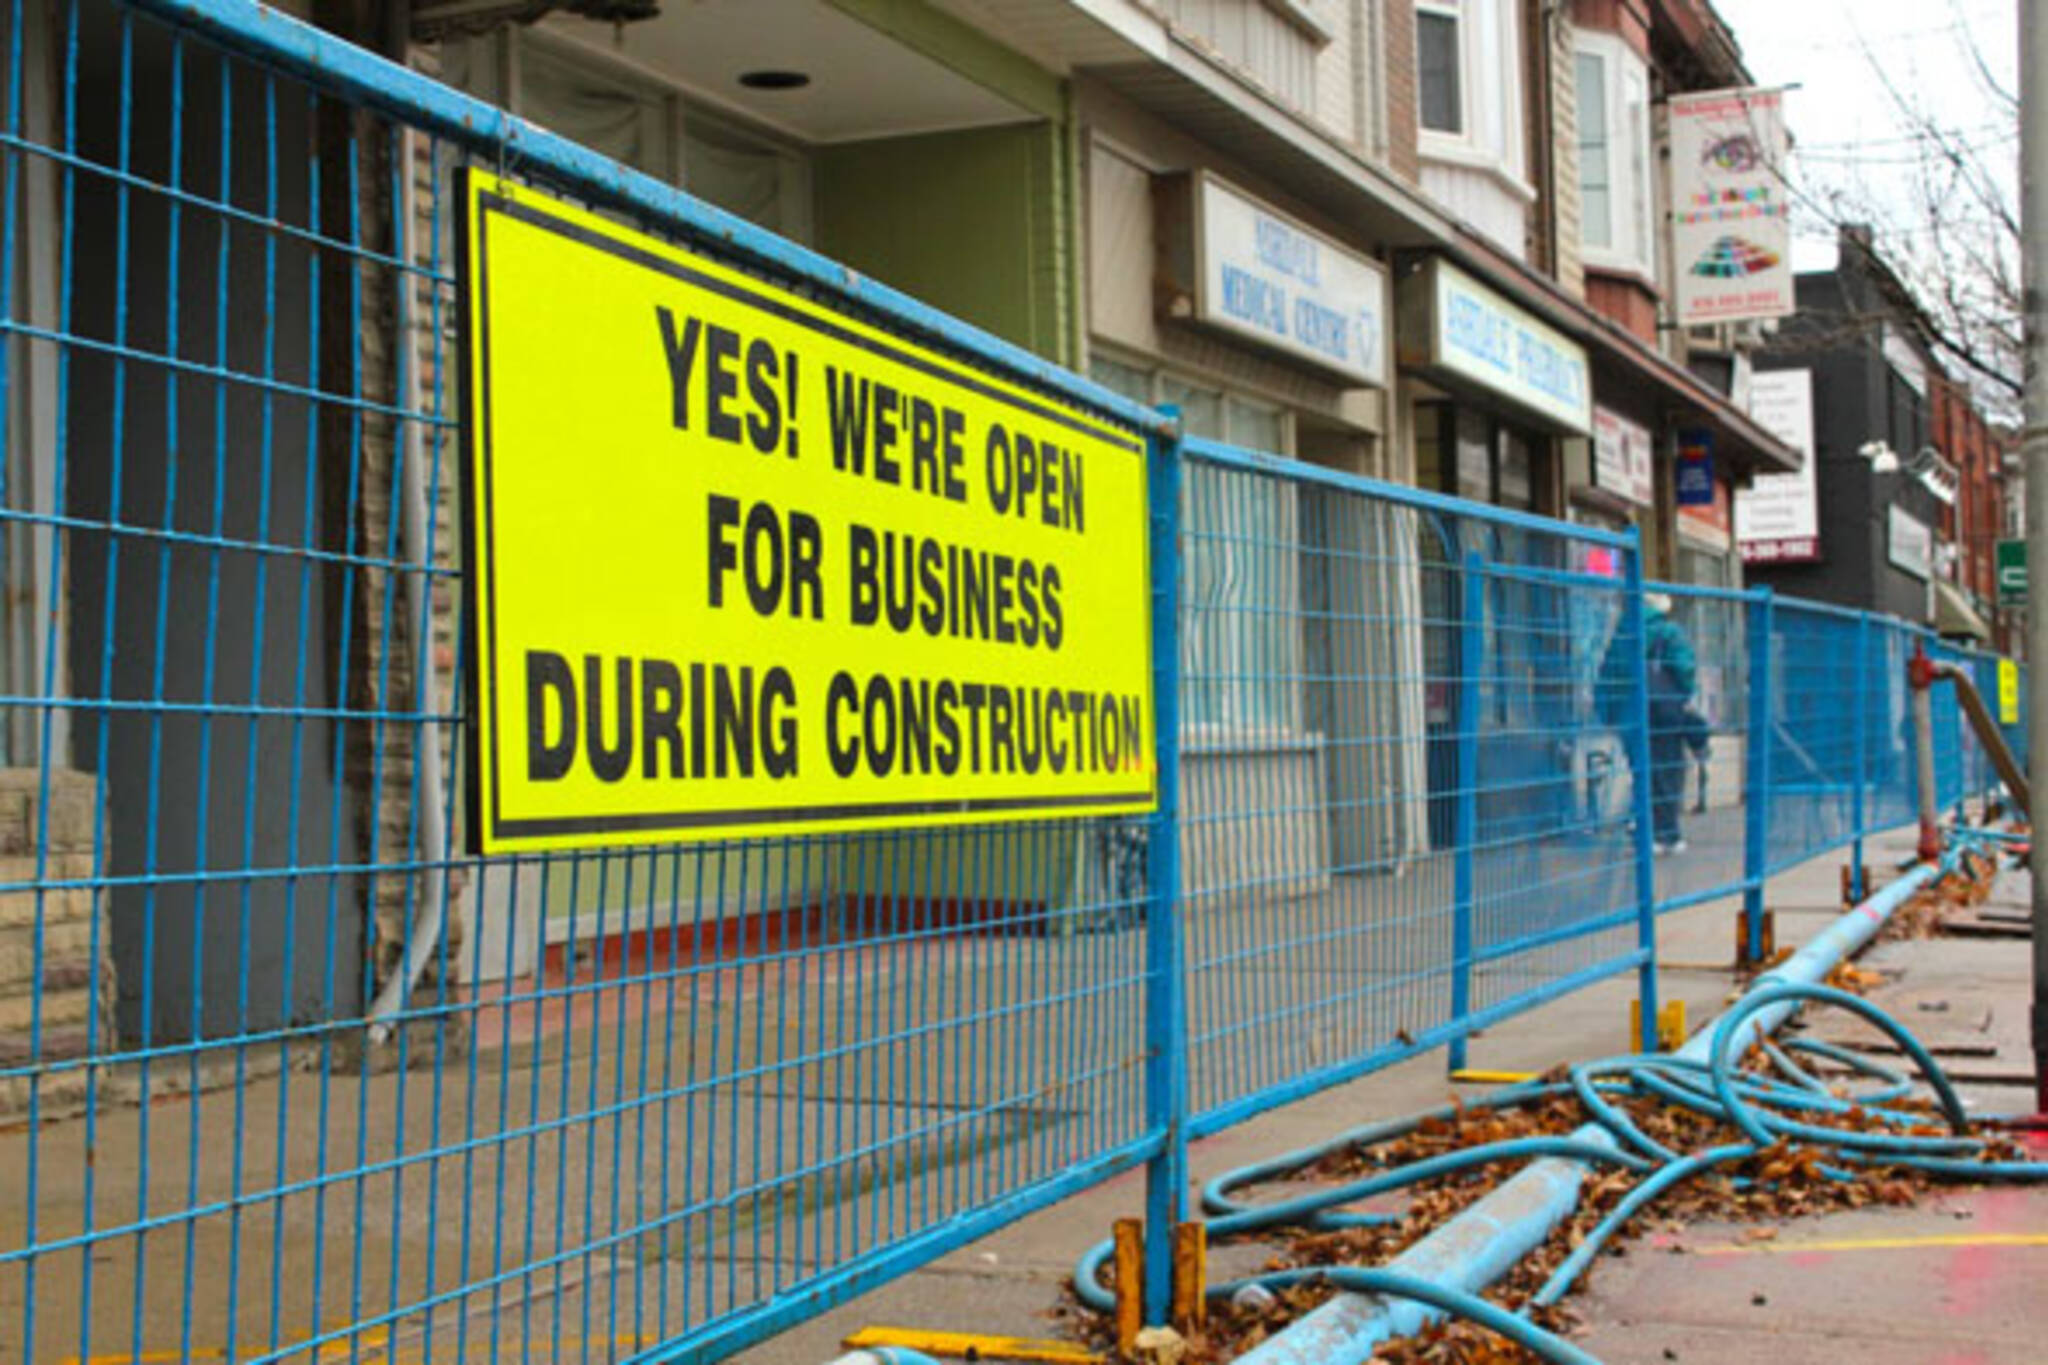 Queen Coxwell construction